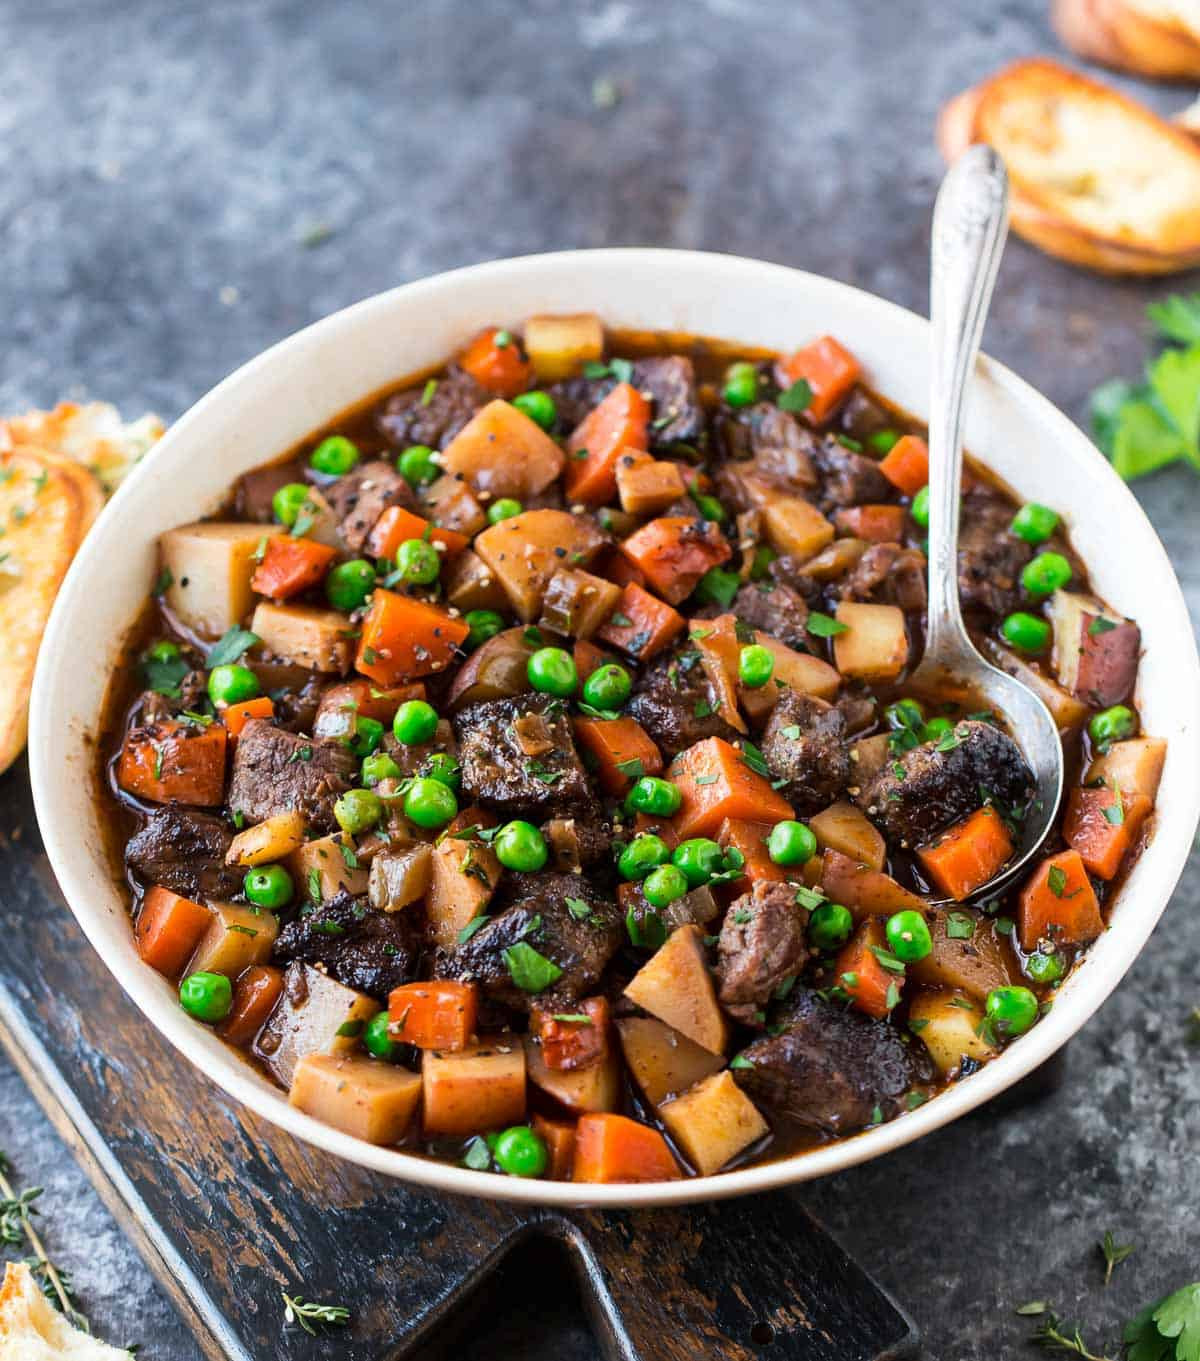 Beef Stew In Crockpot  Crock Pot Beef Stew Recipe